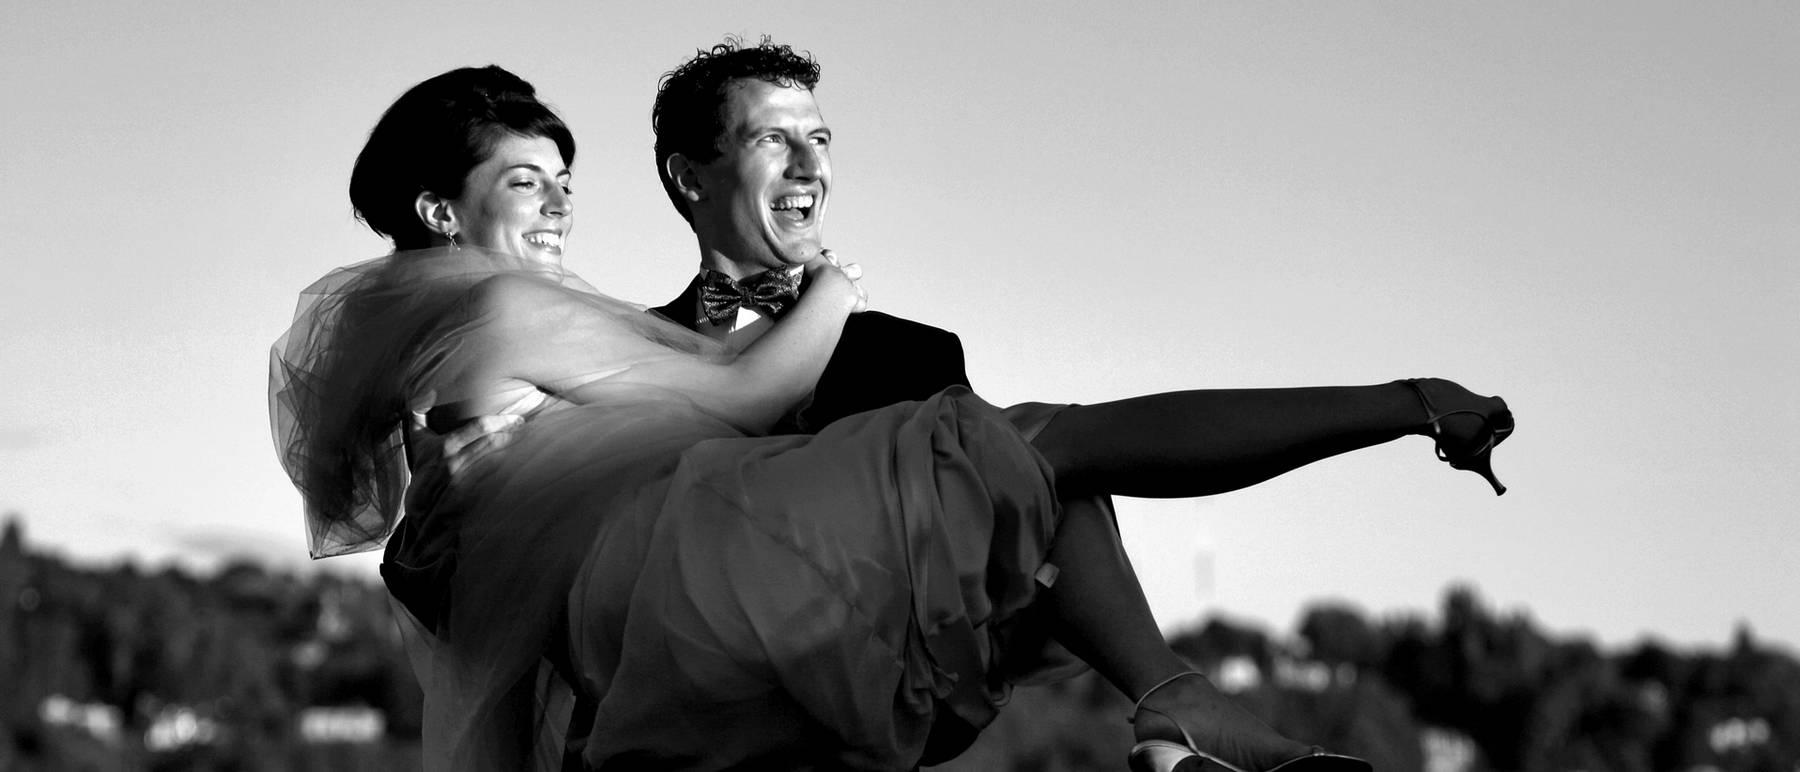 johnandjoseph-wedding-photographer-hz-slider-298